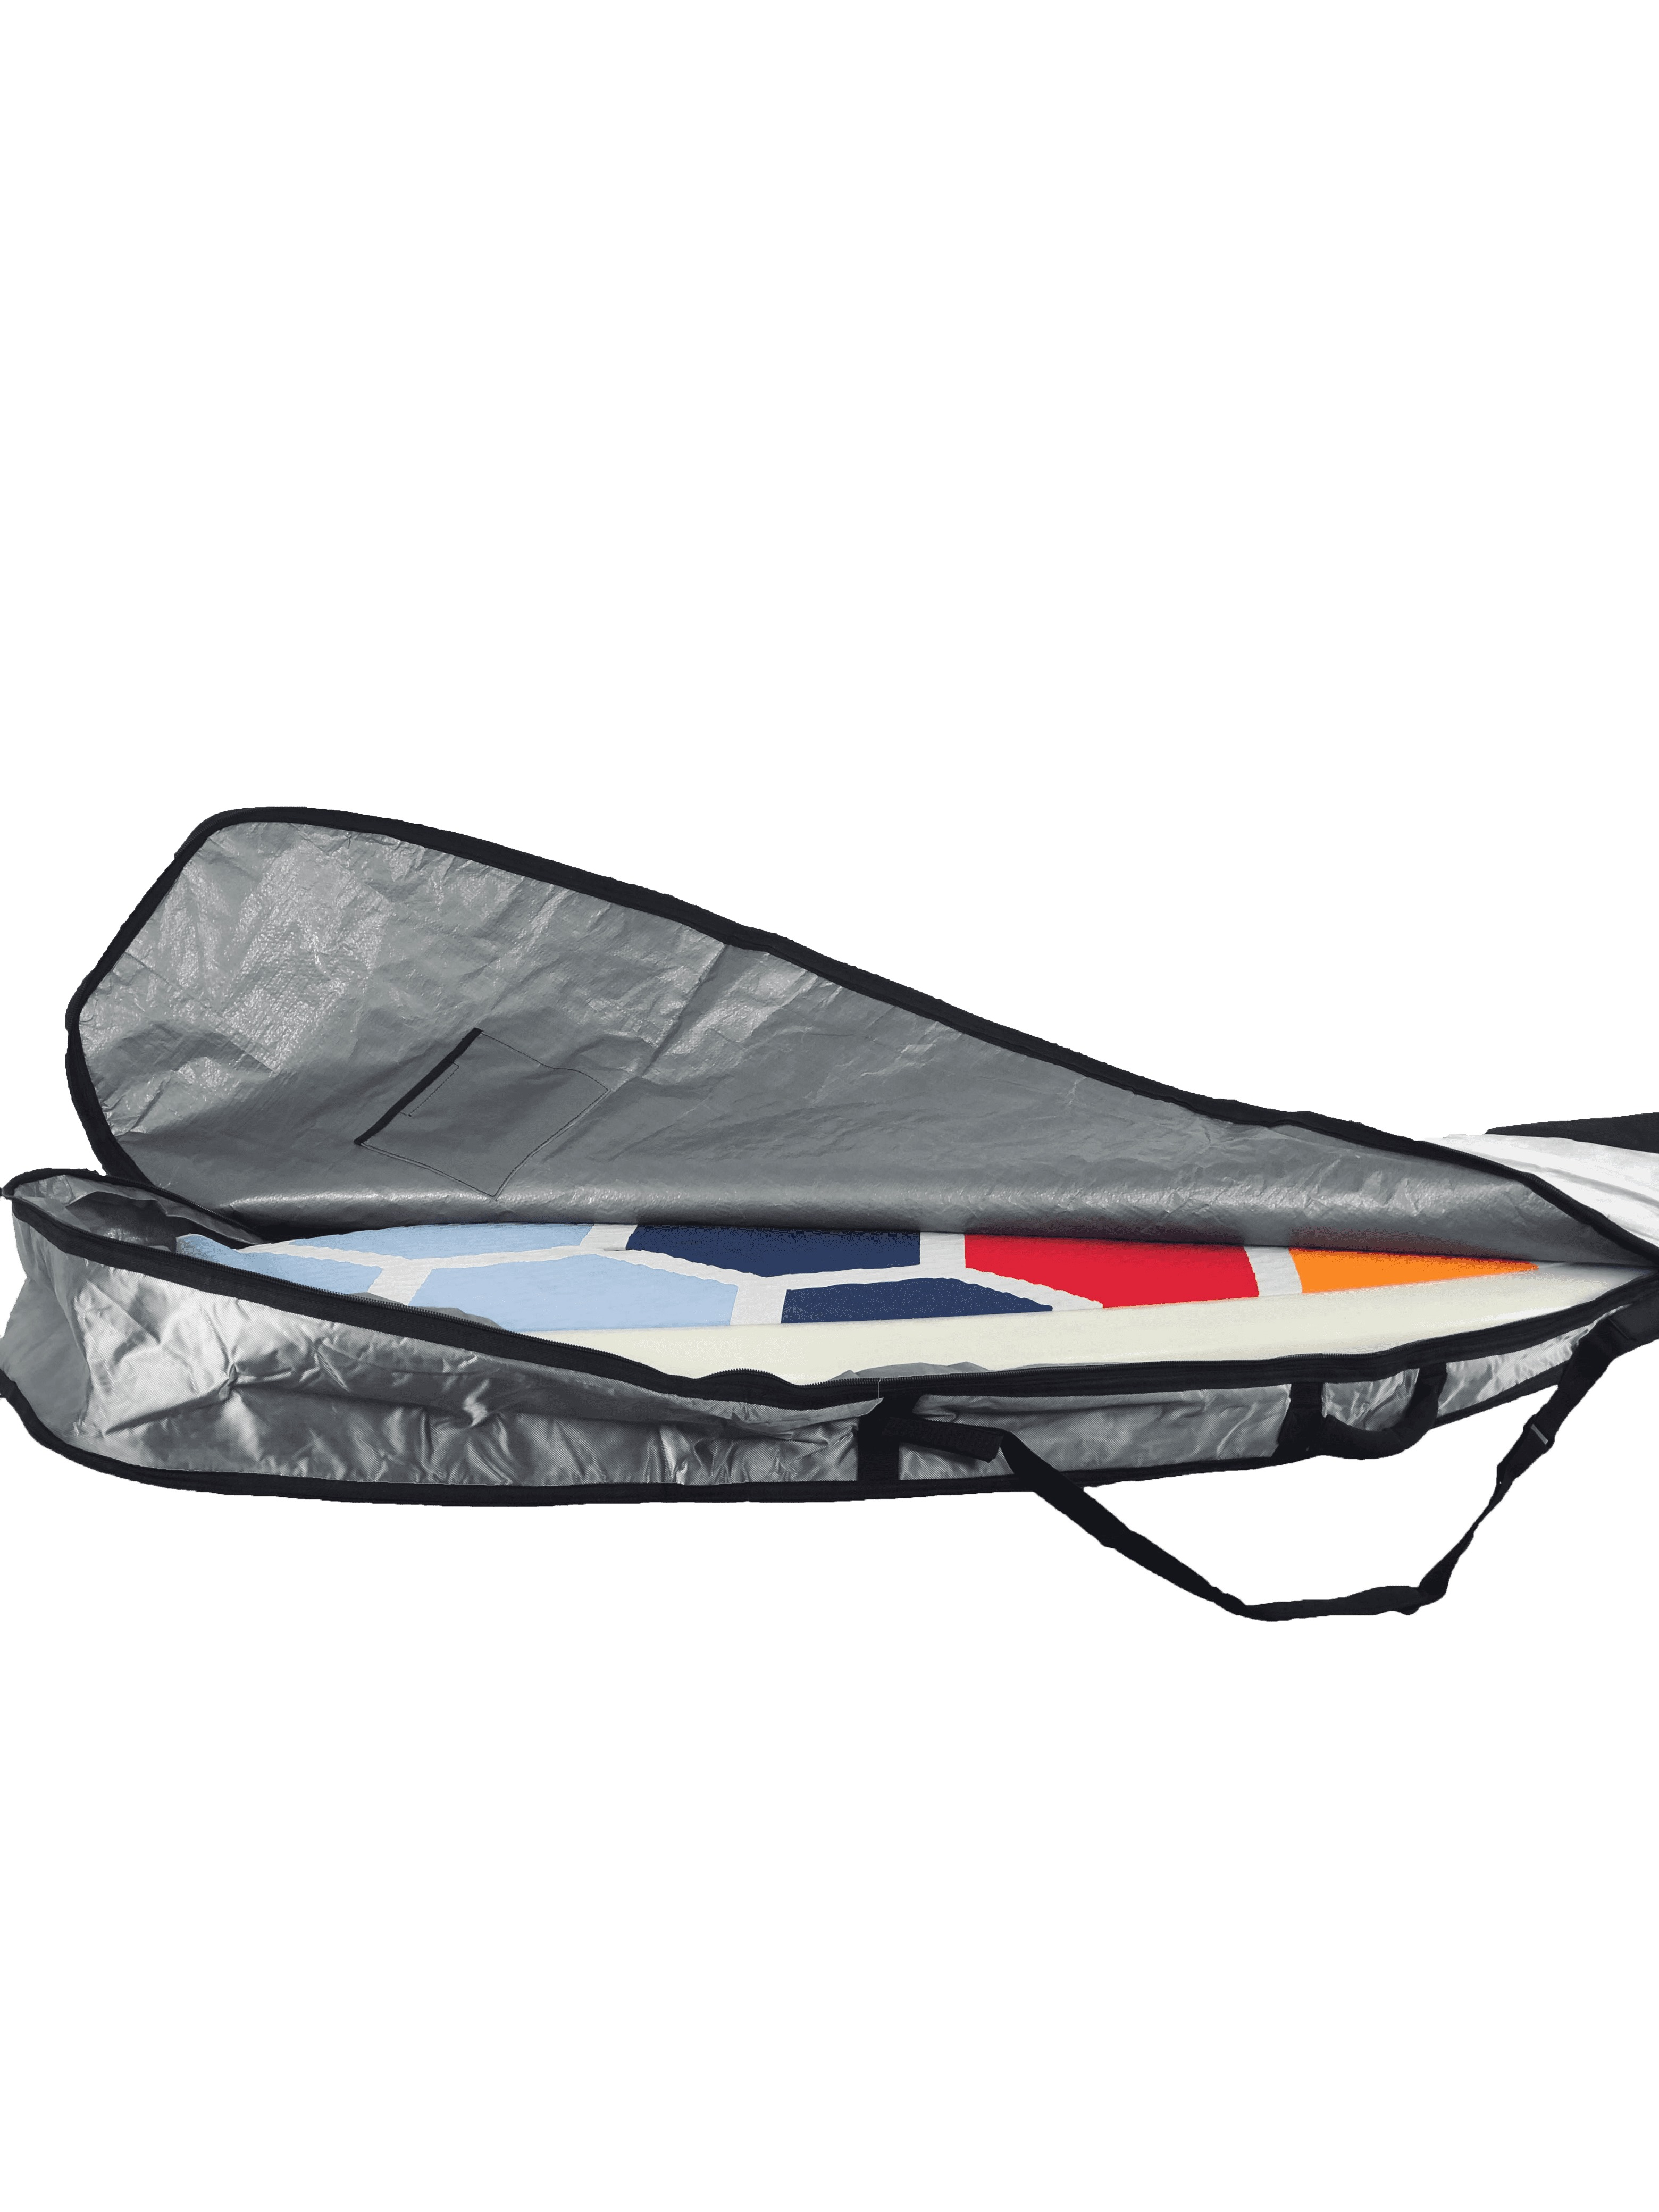 housse pour stand up paddle foil supfoil - haut de gamme - boardbag - Sroka - opening - zip